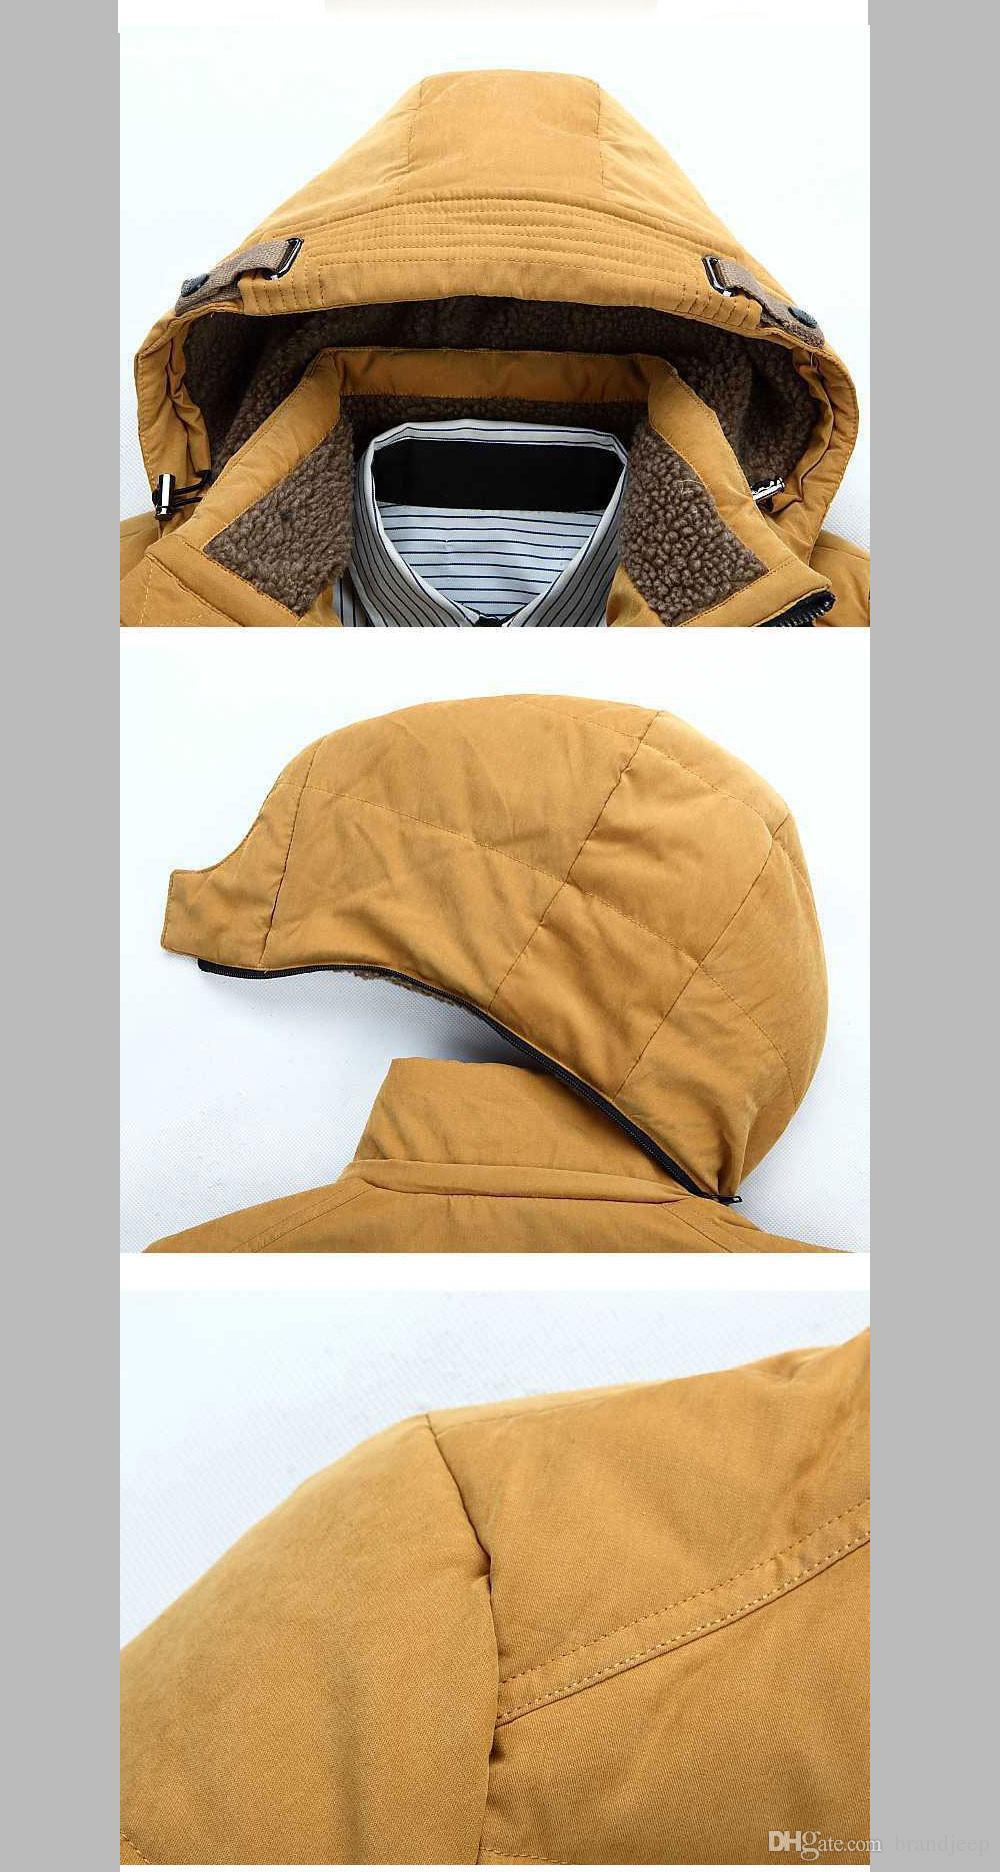 50% OFF Thick Warm Duck Down Winter Jacket Men Winter Parkas Hooded Coat Outdoor Down-Jacket 160